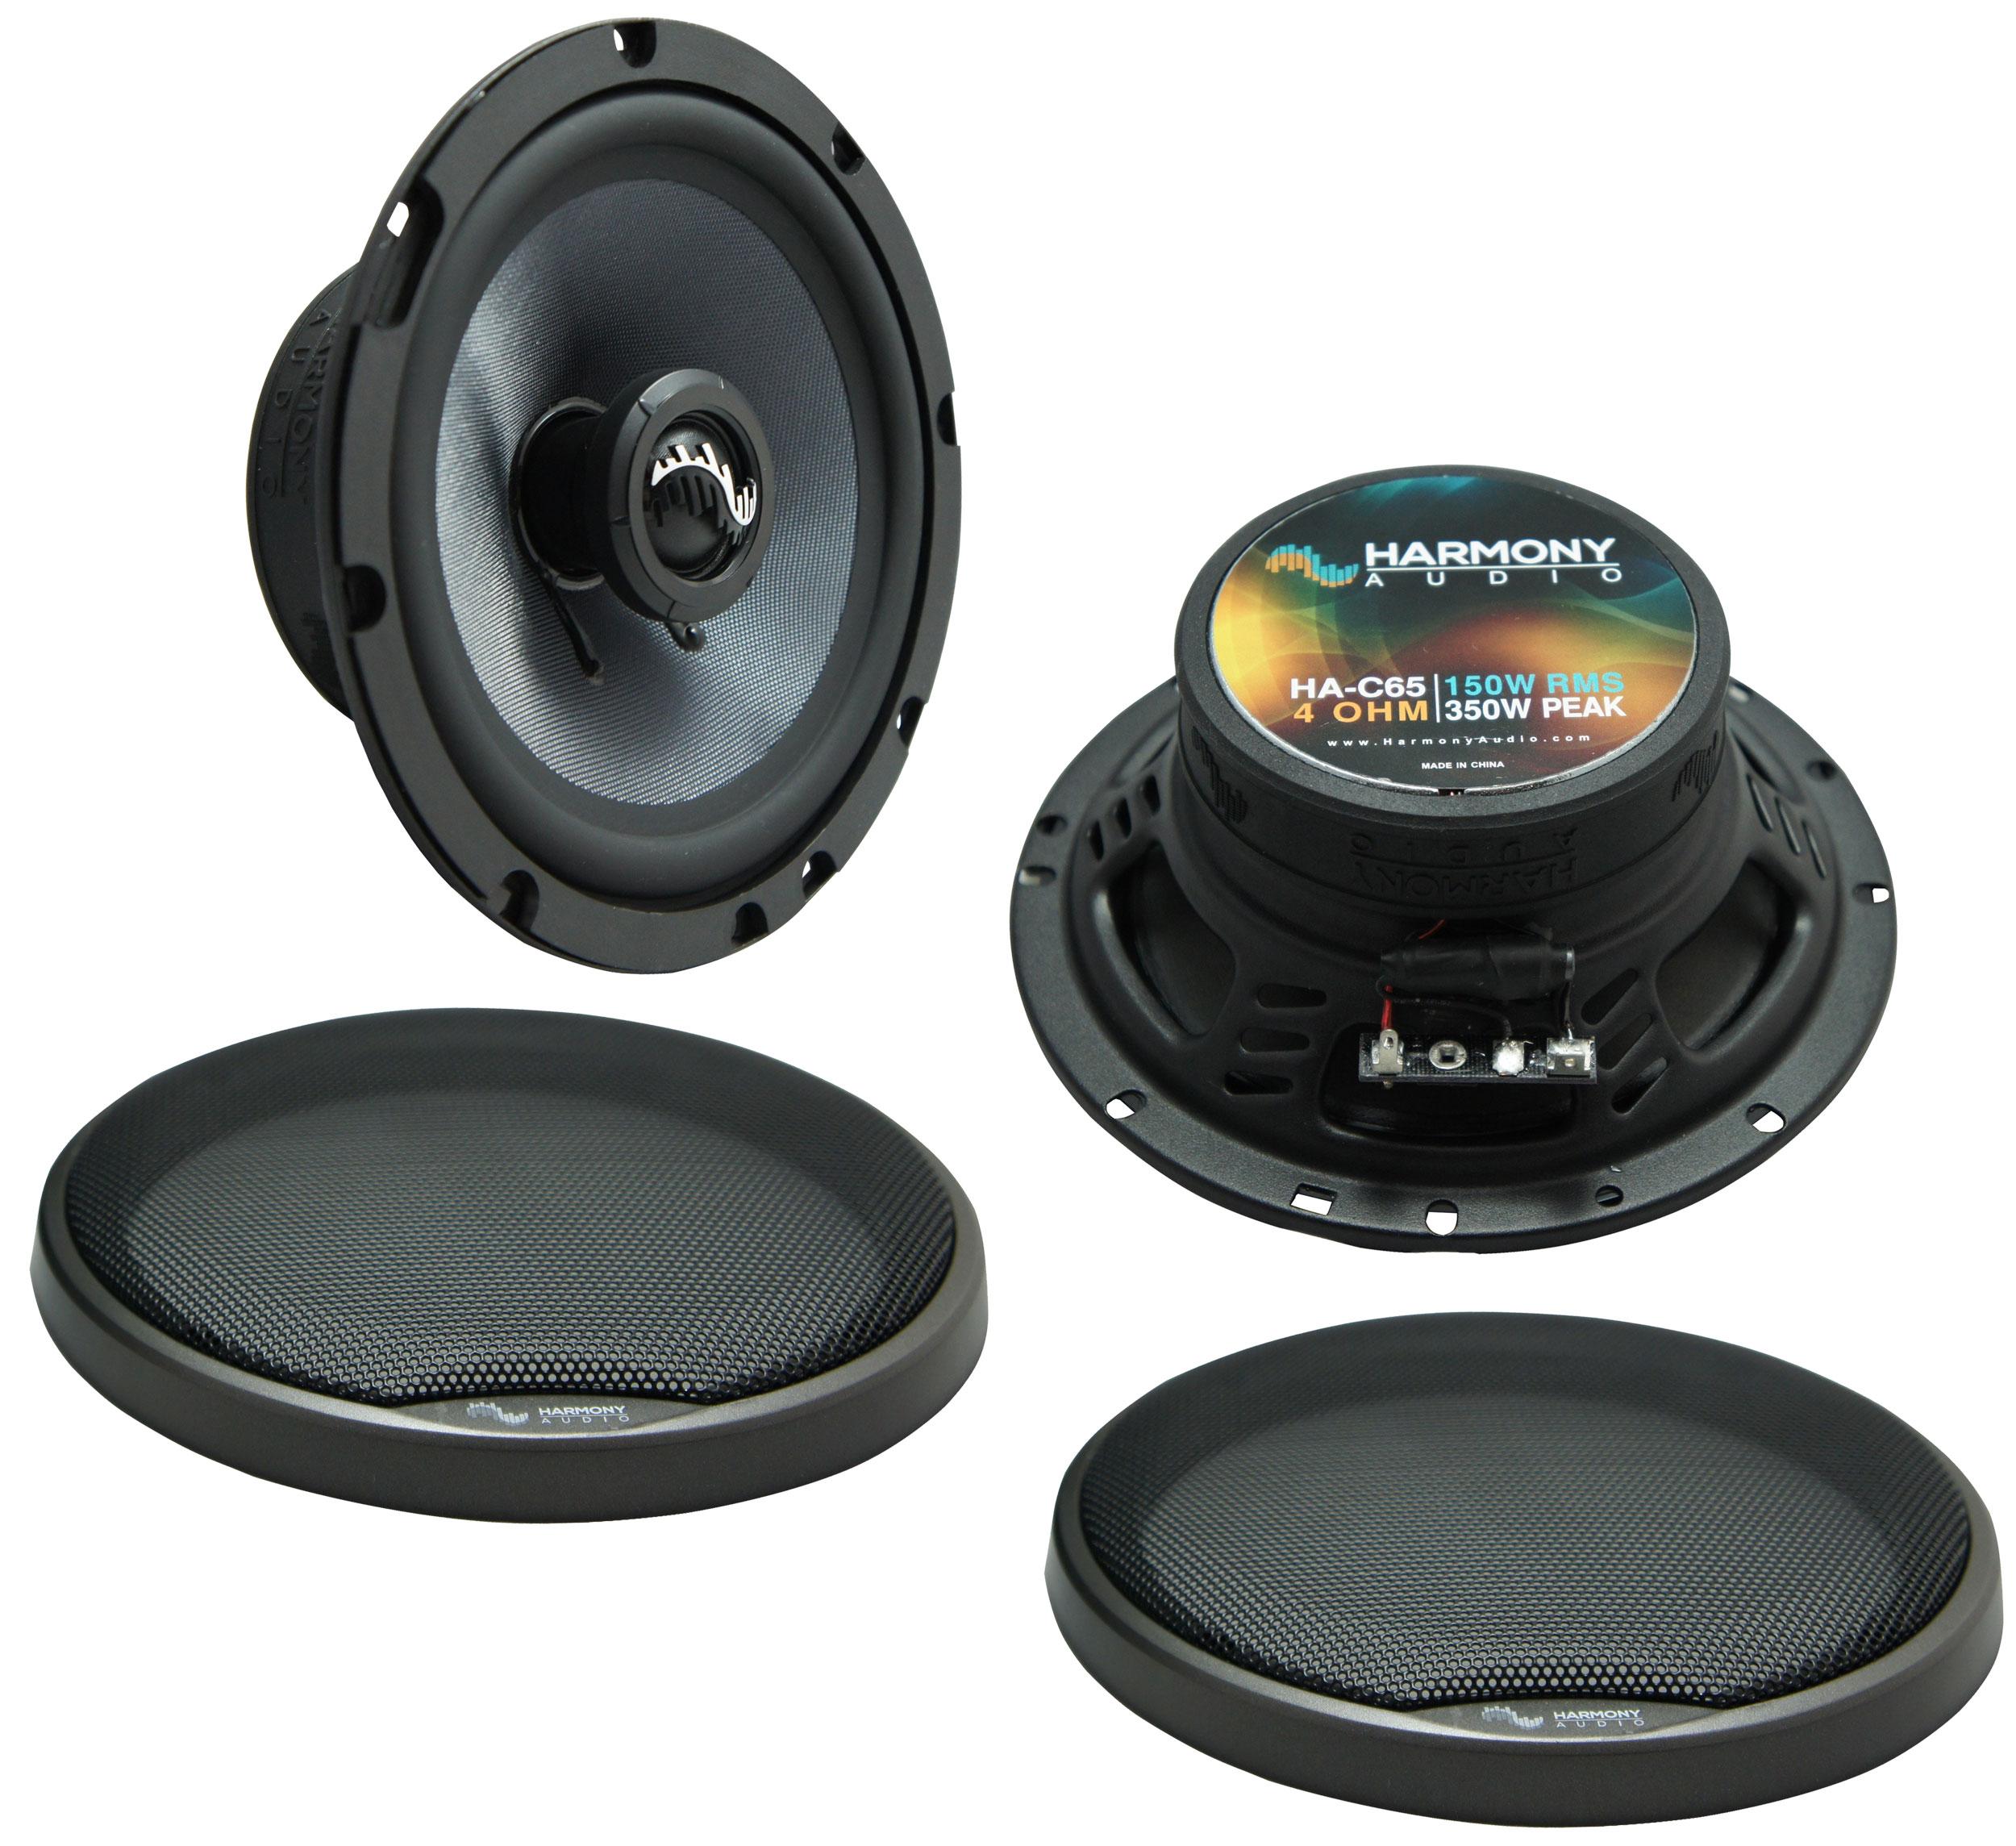 Fits Infiniti G35 2003-2008 Front Door Replacement Harmony HA-C65 Premium Speakers New